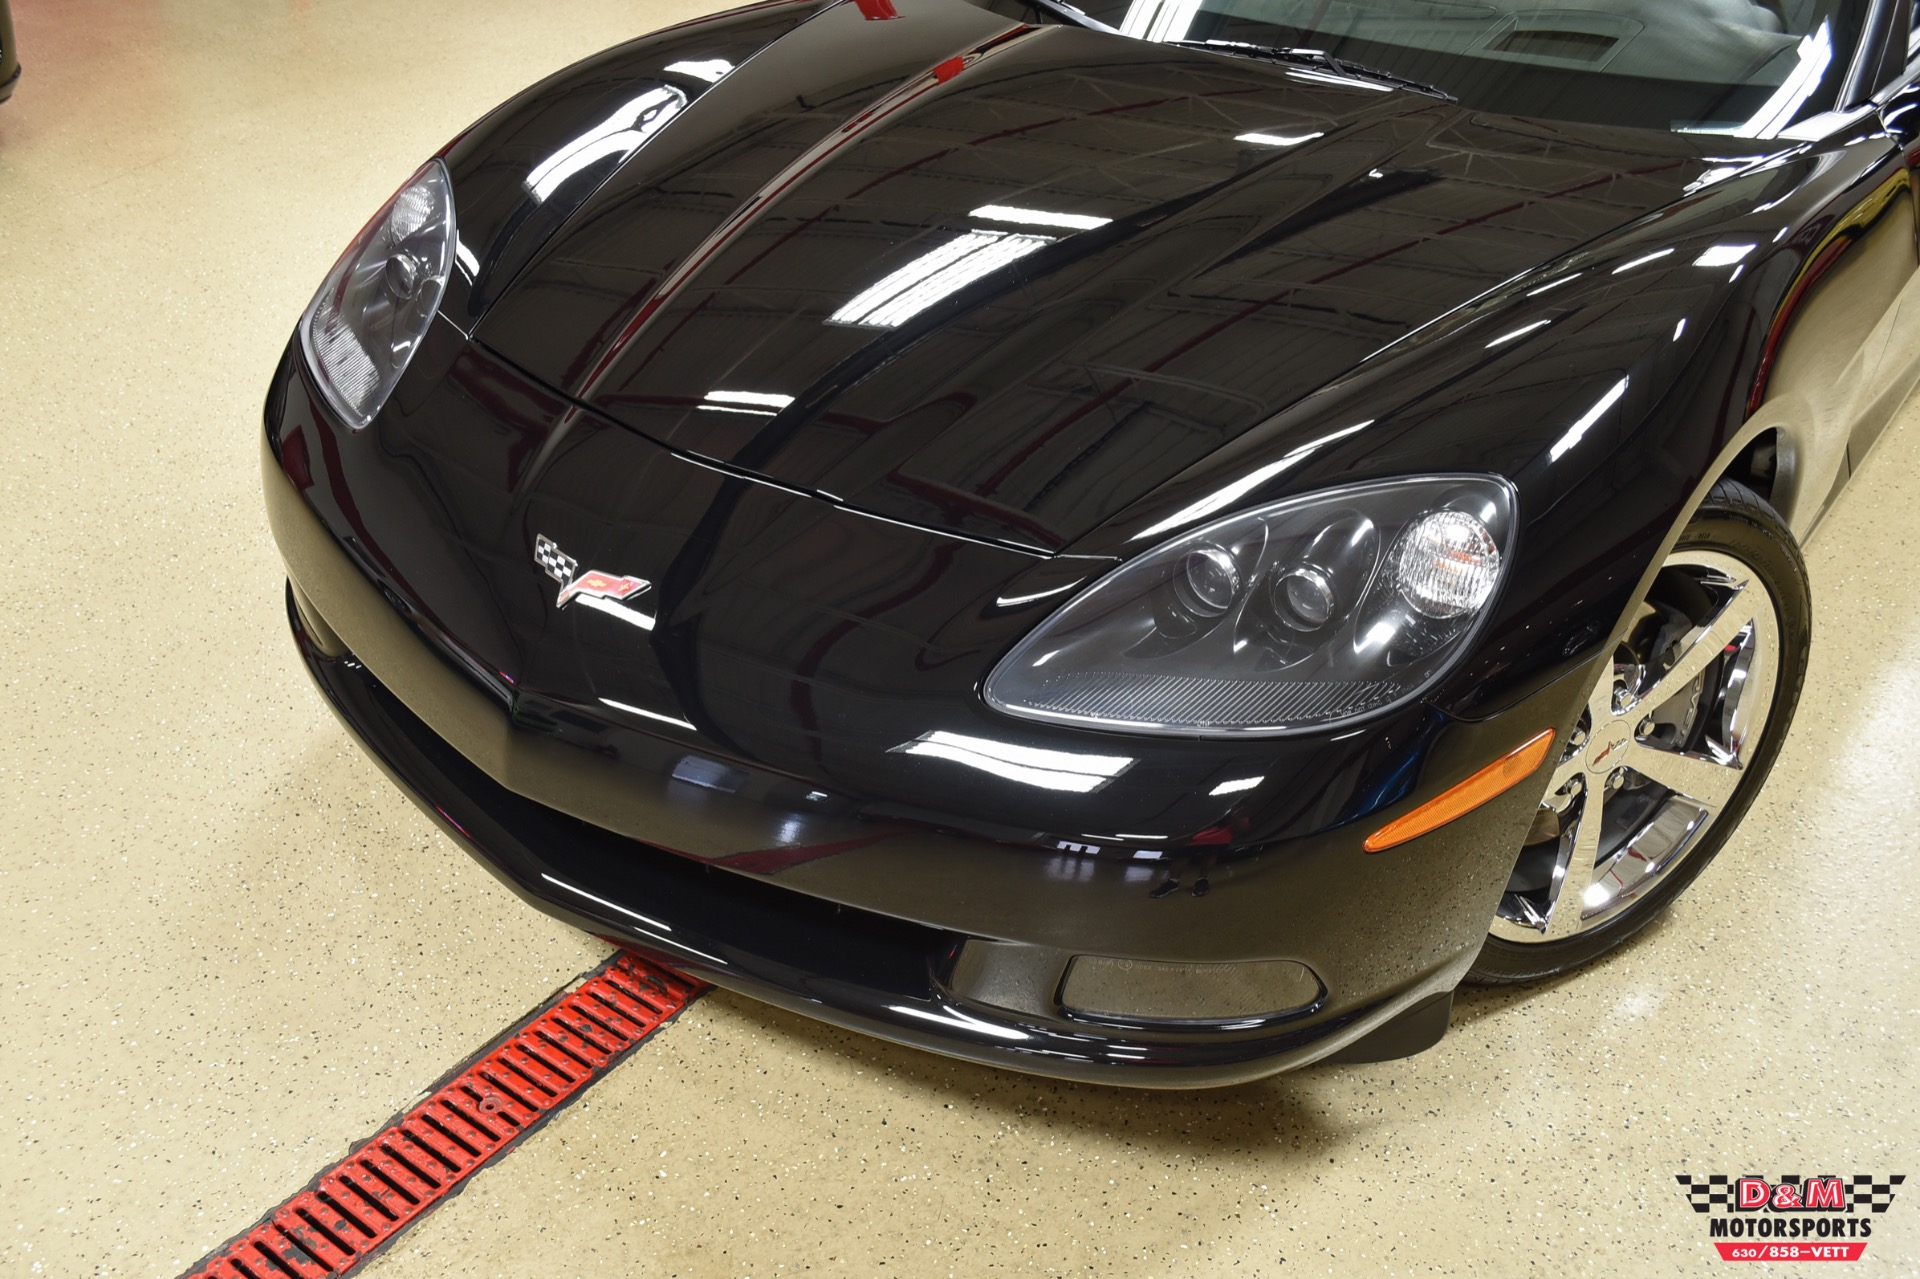 Used 2010 Chevrolet Corvette Convertible | Glen Ellyn, IL